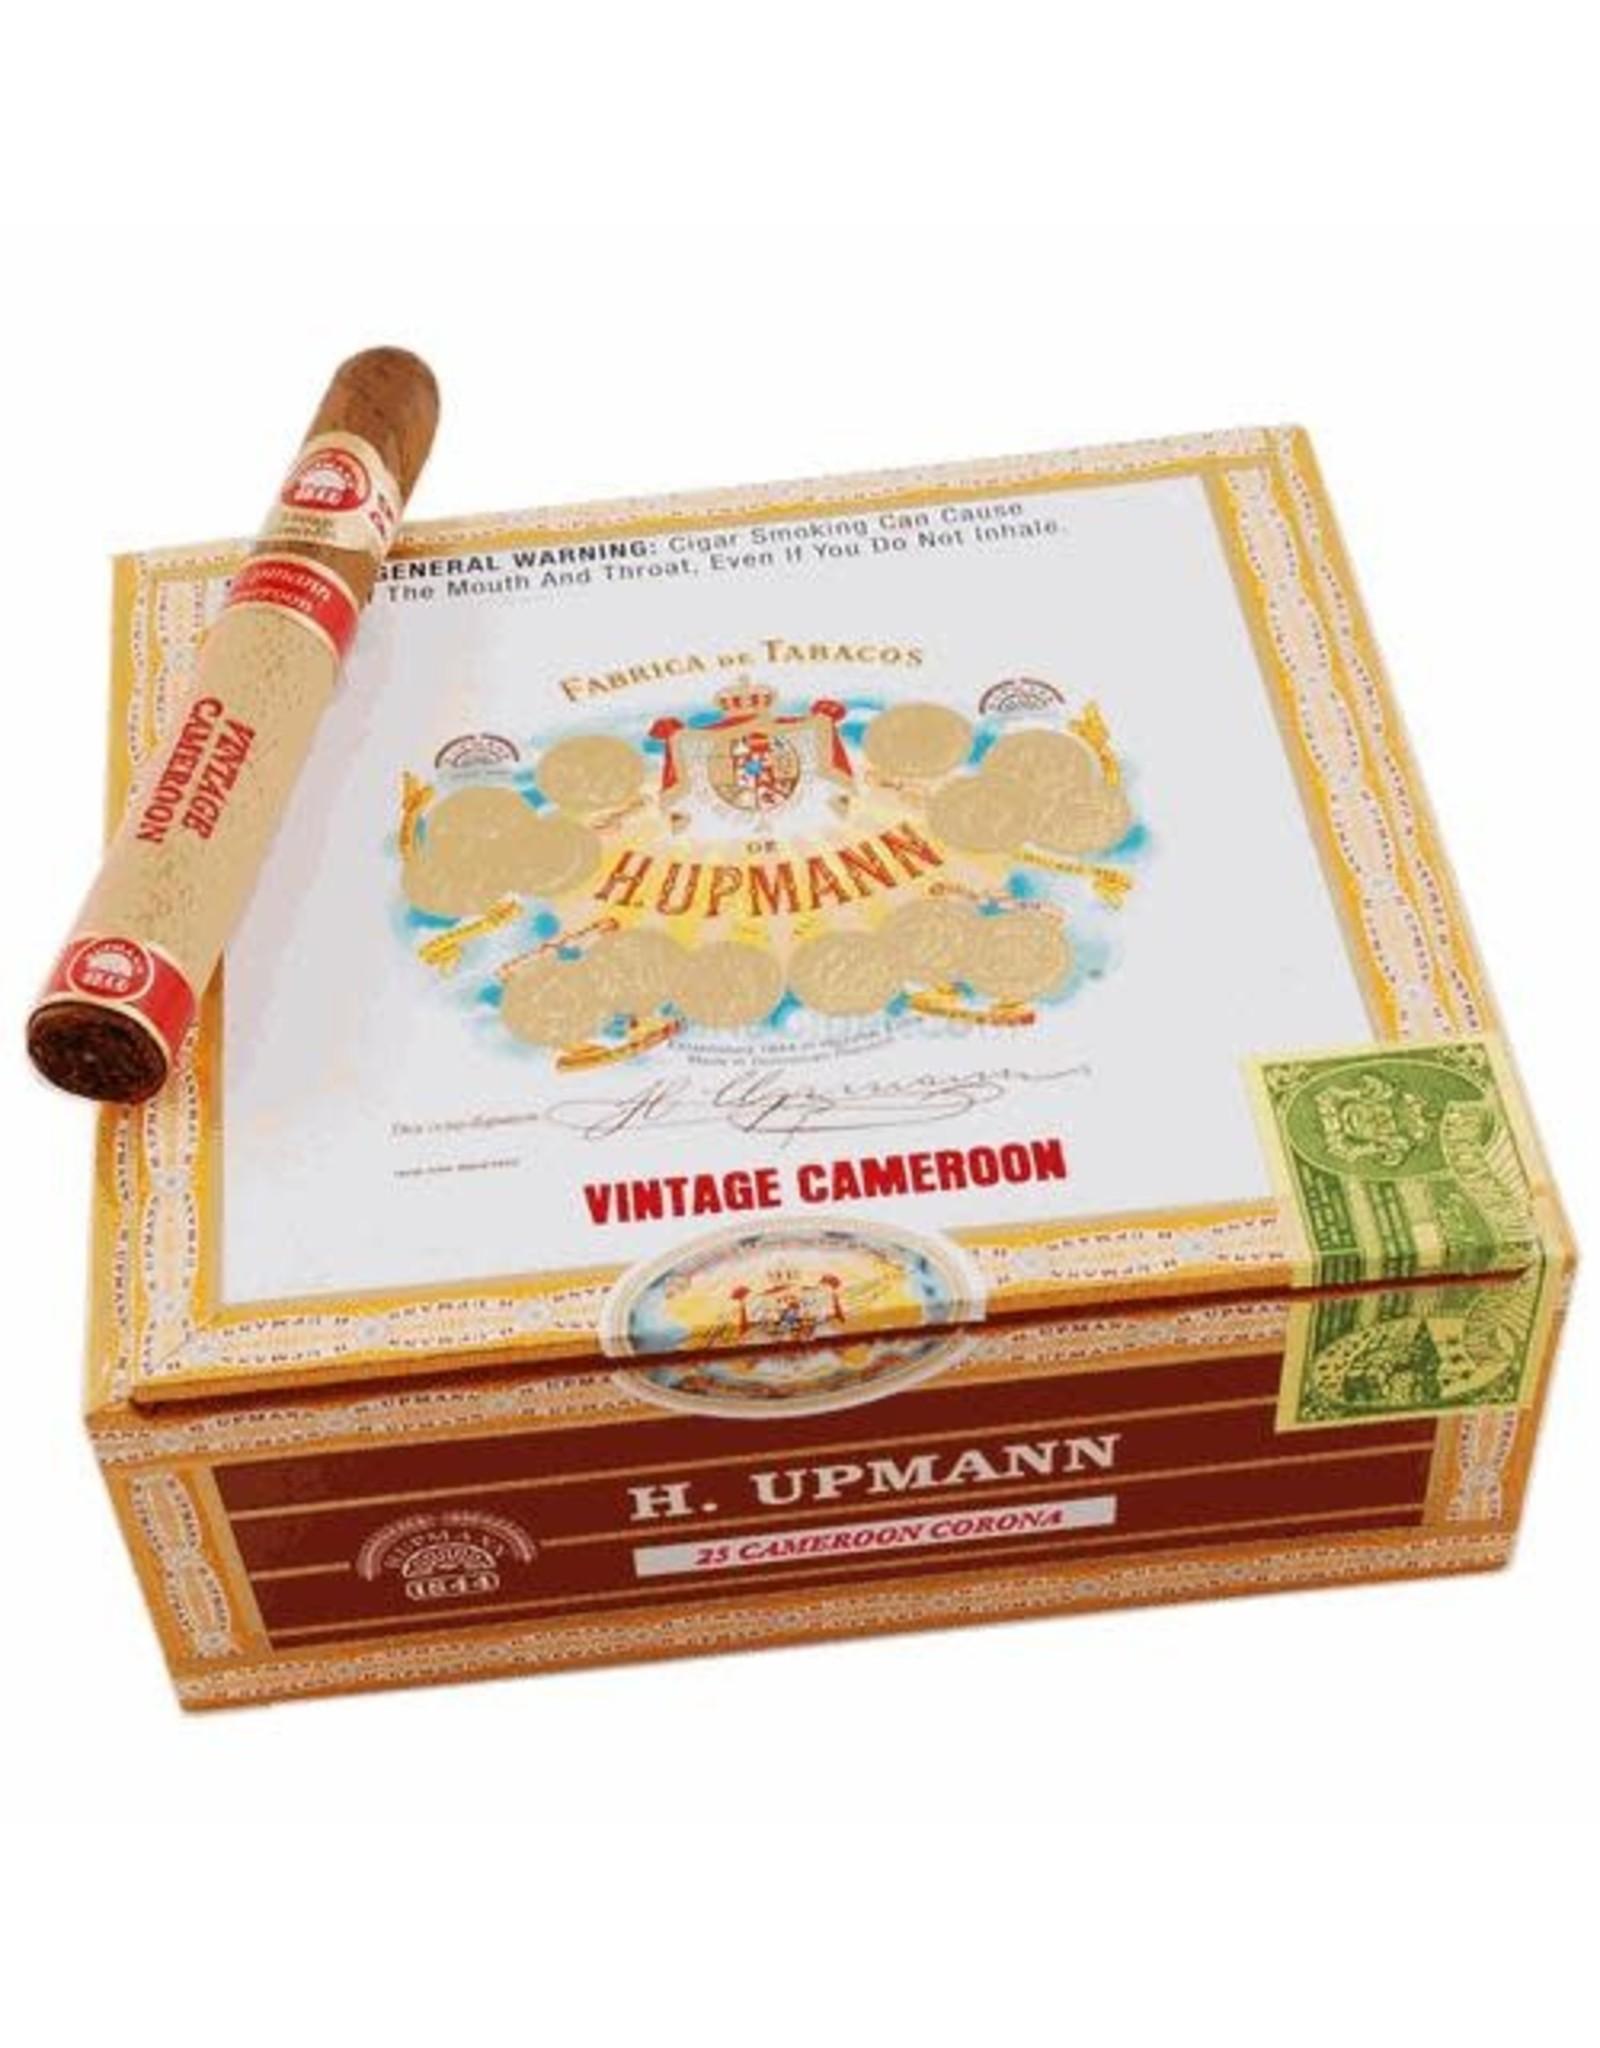 H. Upmann Texas Derrick Cubano Edition